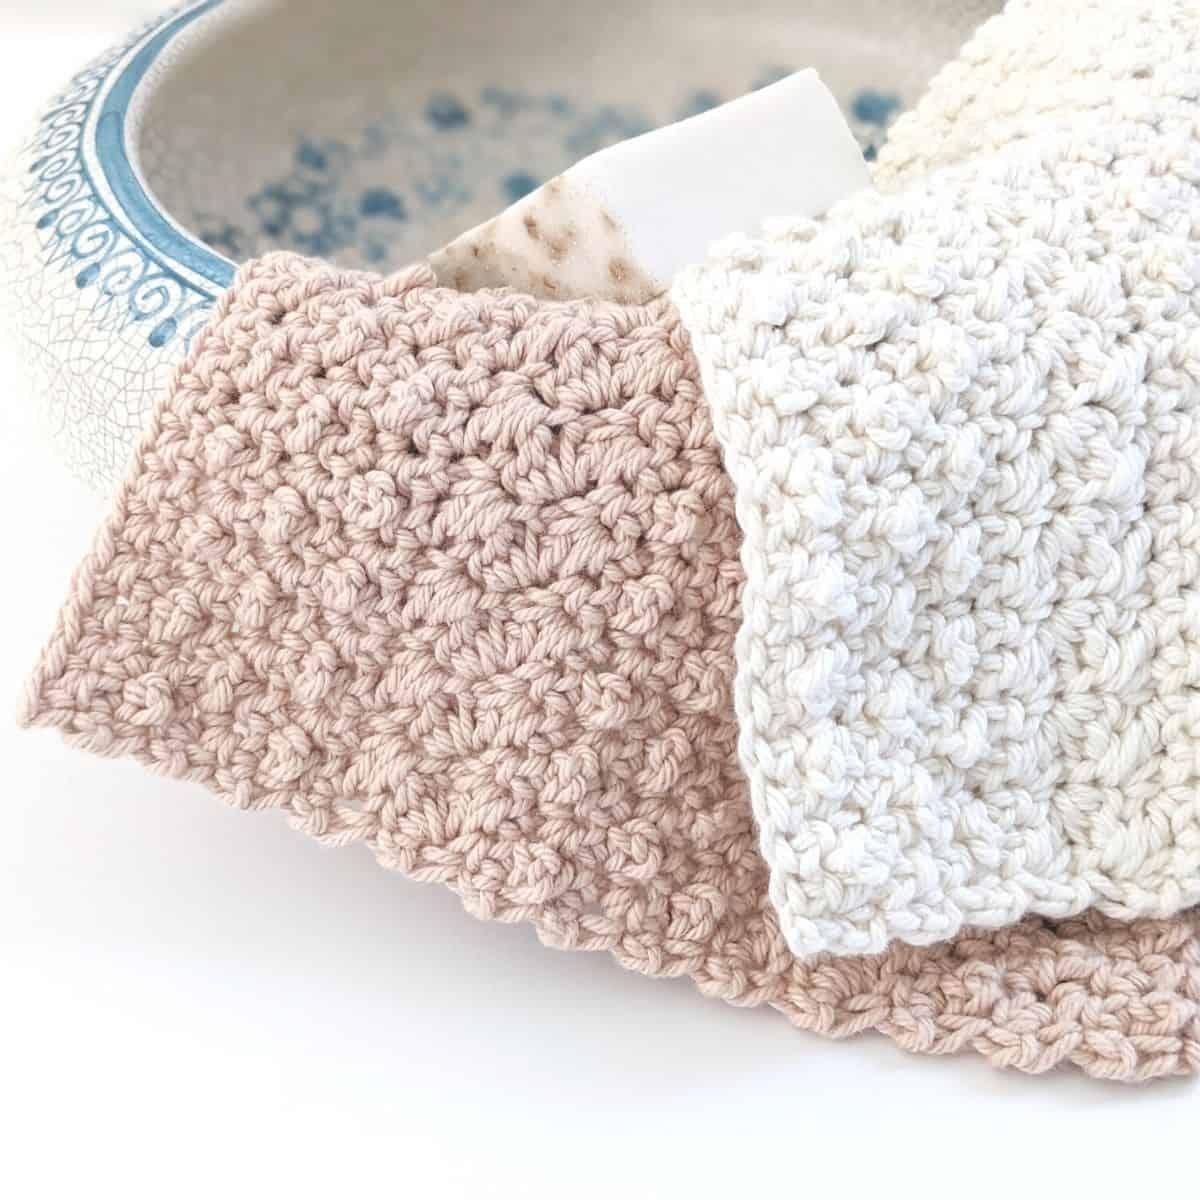 Rustic Cotton Dishcloth – Free Crochet Pattern